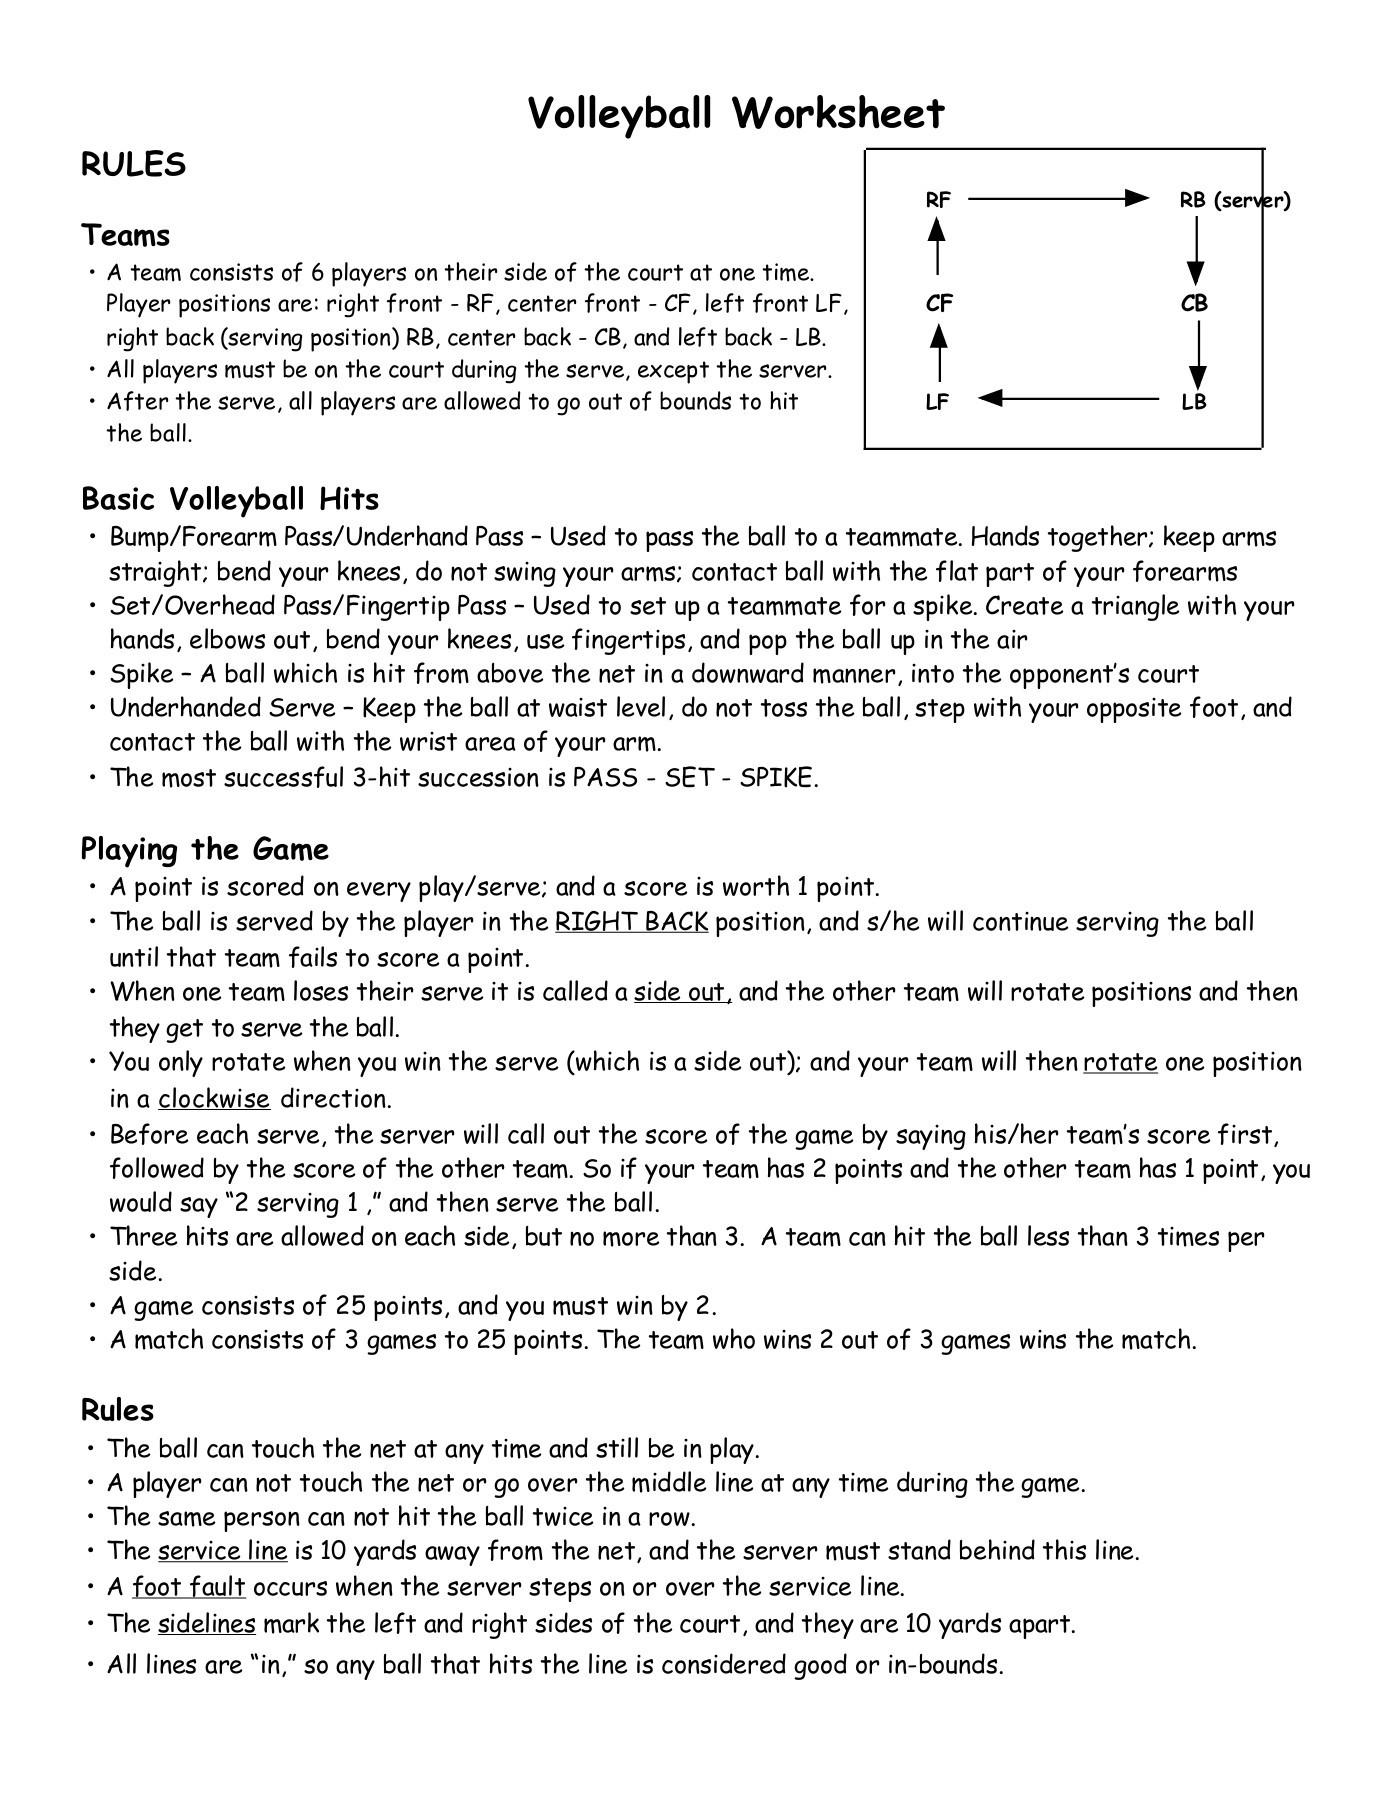 Worksheets Volleyball Worksheets Cheatslist Free Worksheets For Kids Amp Printable